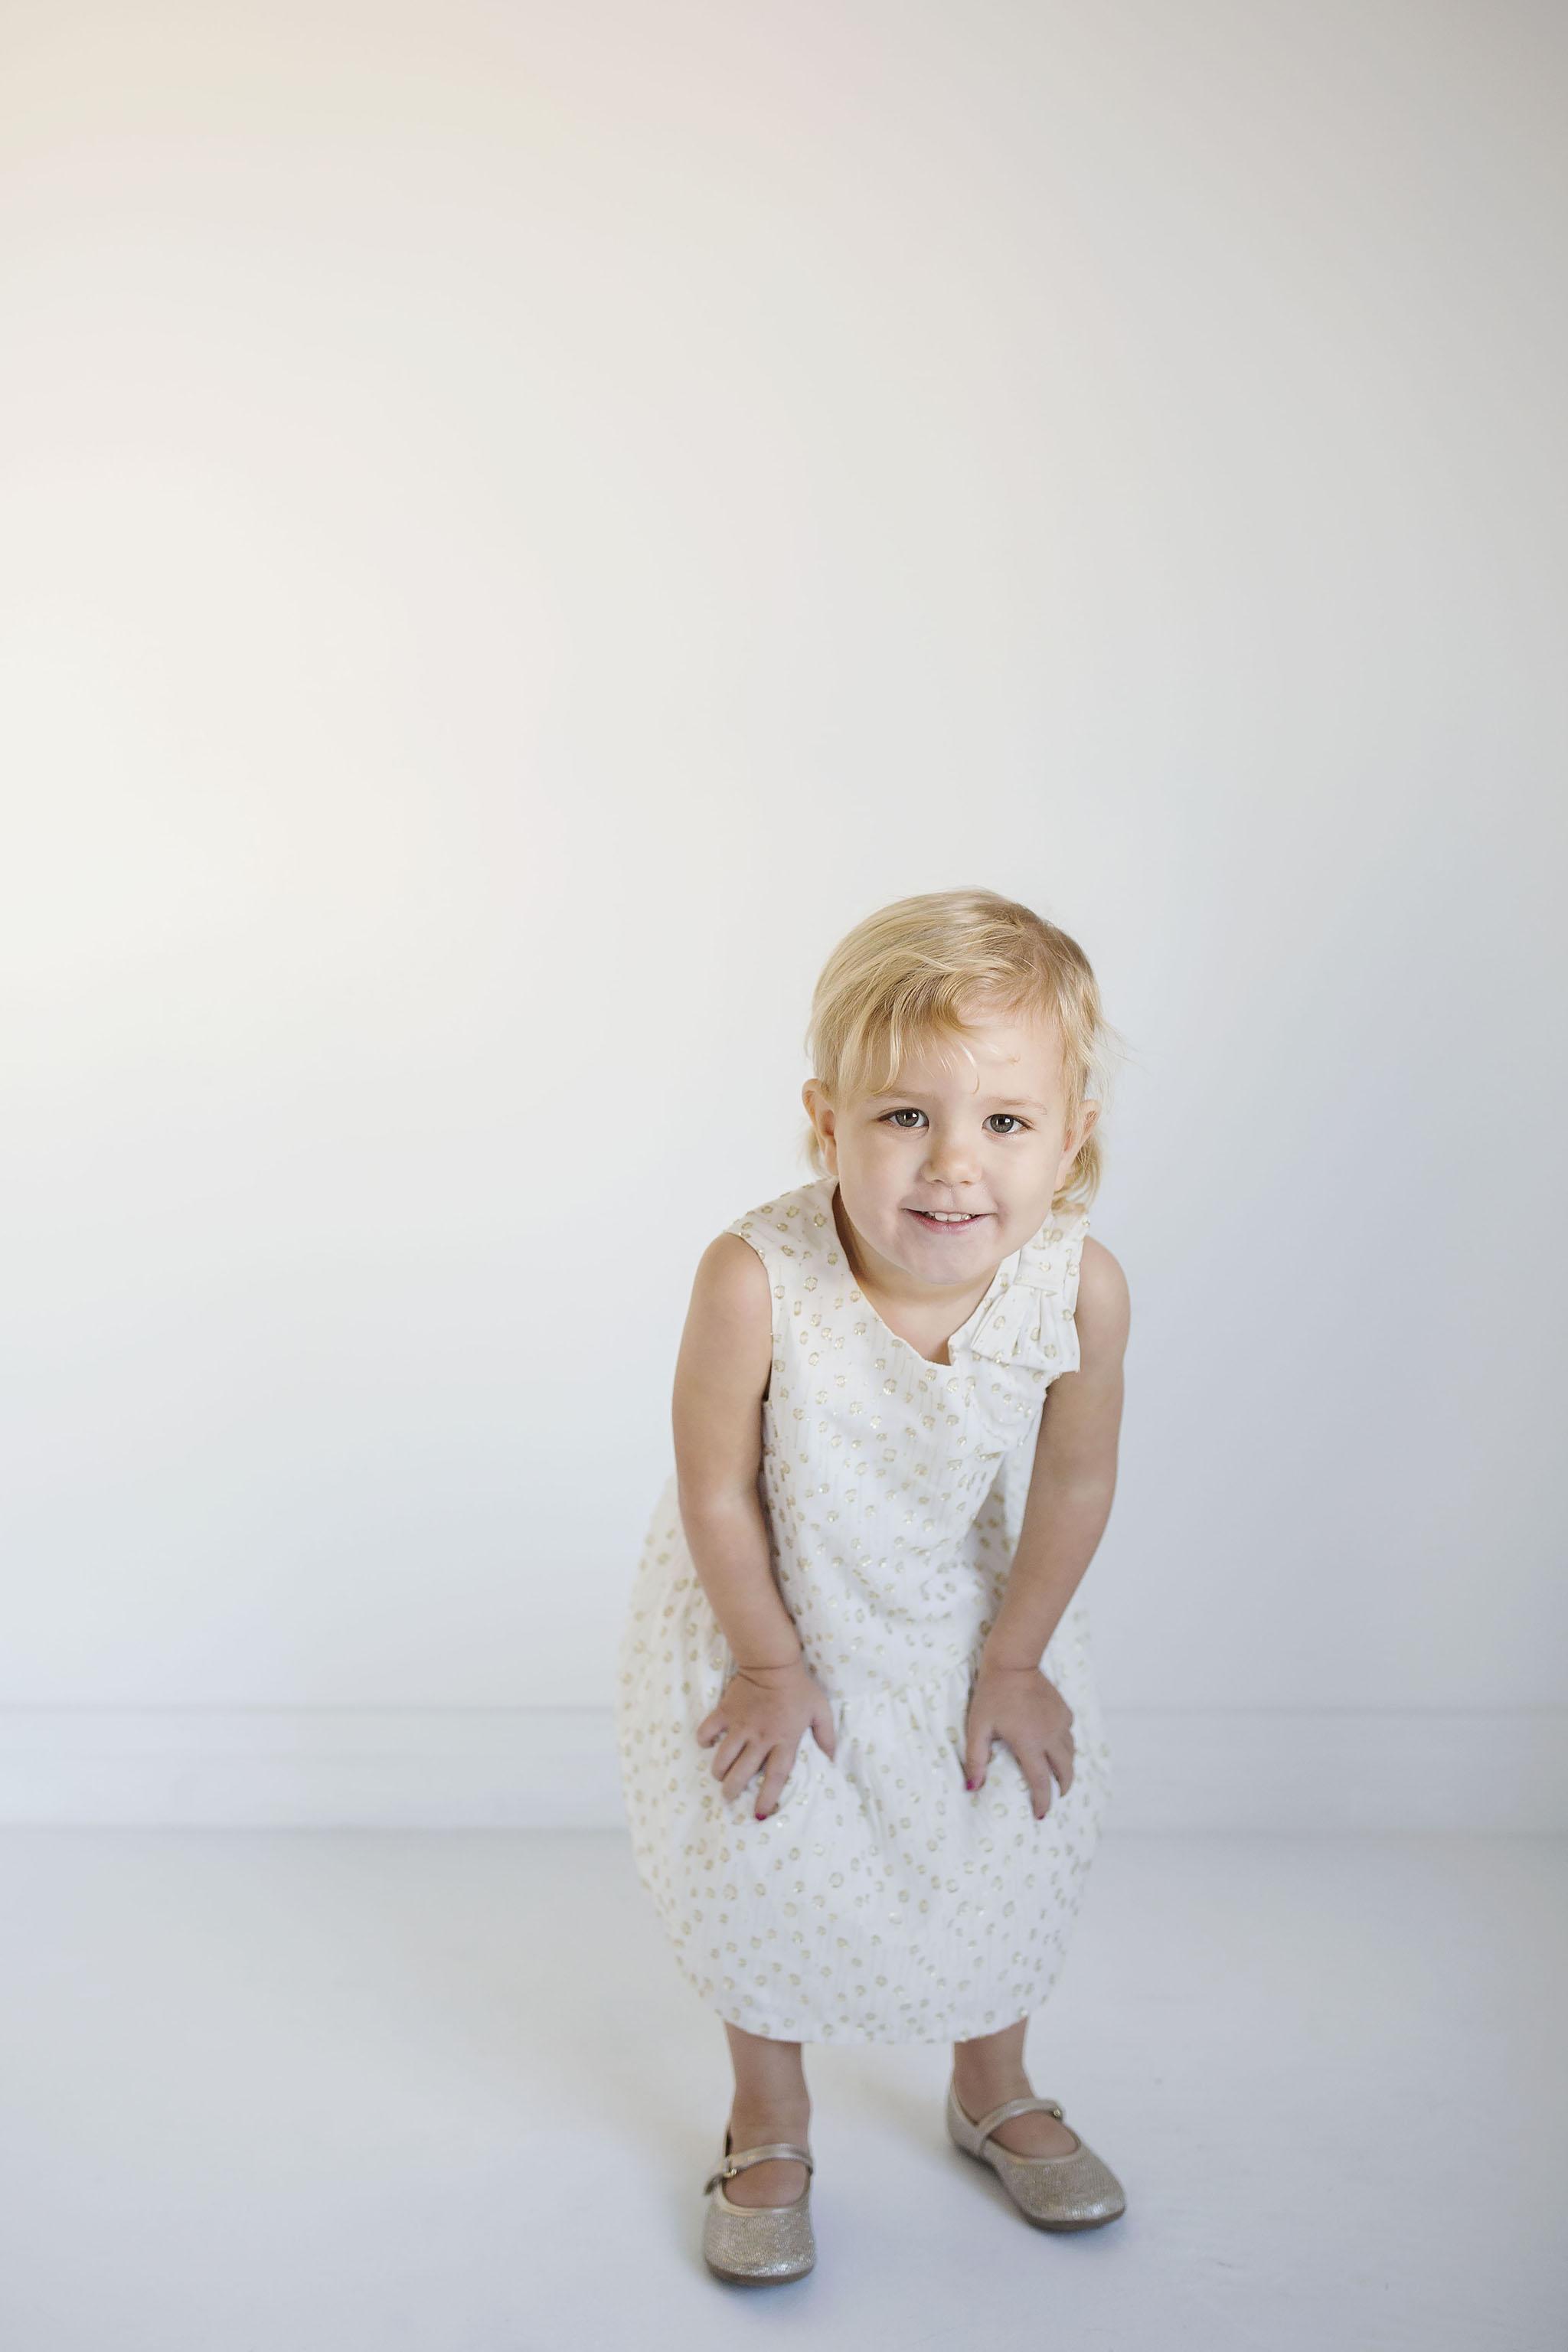 london_ontario_family_photographer-studio_photography-studio_lifestyle_portraits-white_studio-mother_son-candid_family_photography-raw_footage_photography032.jpg